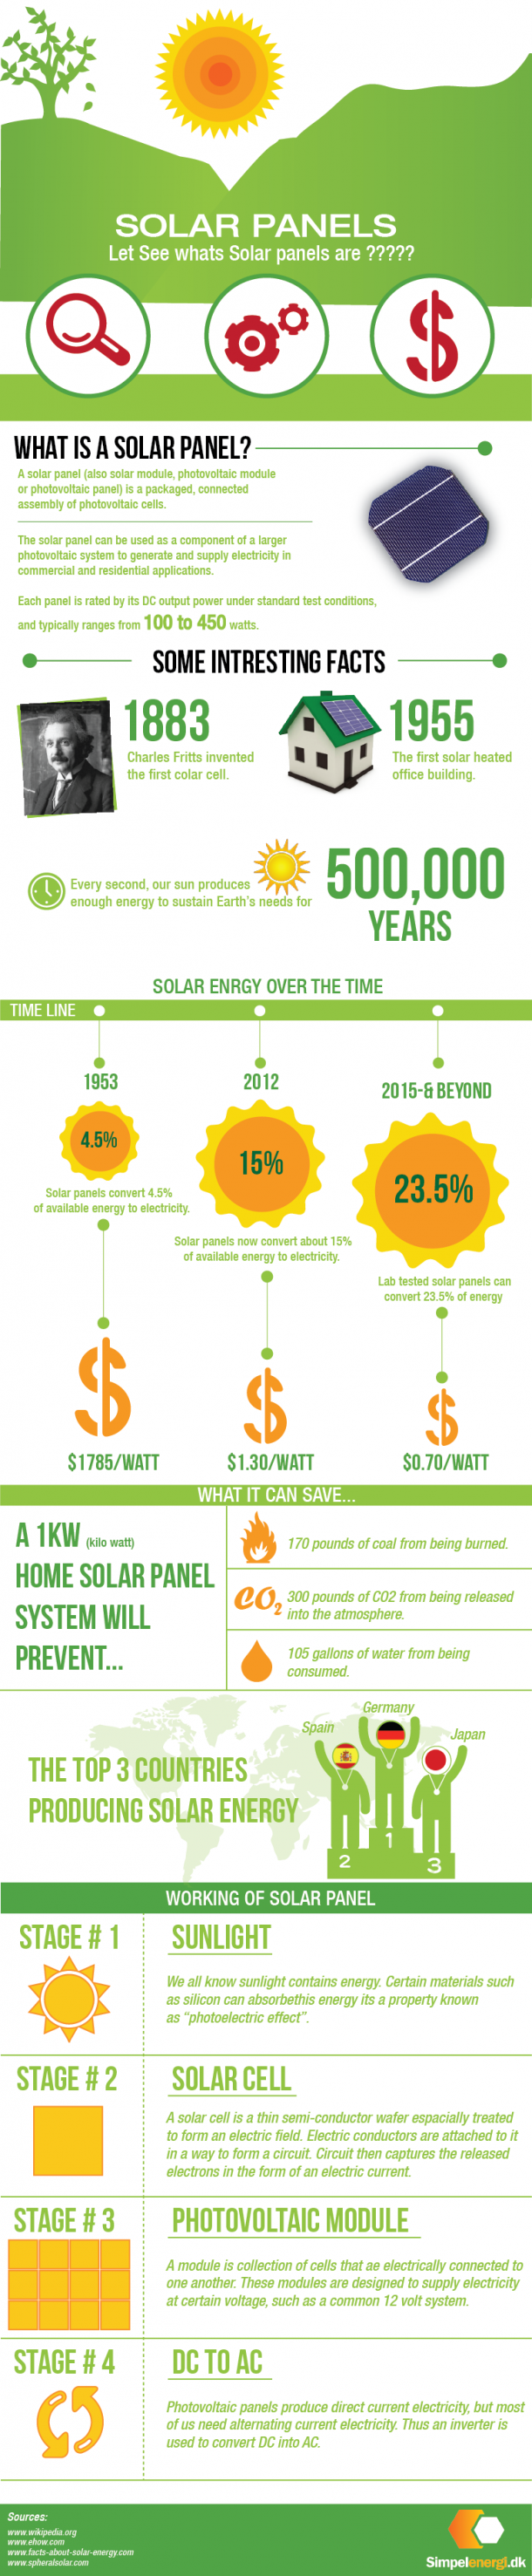 Implementing Renewable Solar Energy Http Bigideamastermind Com Newmarketingidea Id Moemoney24 Solar Panels Solar Renewable Solar